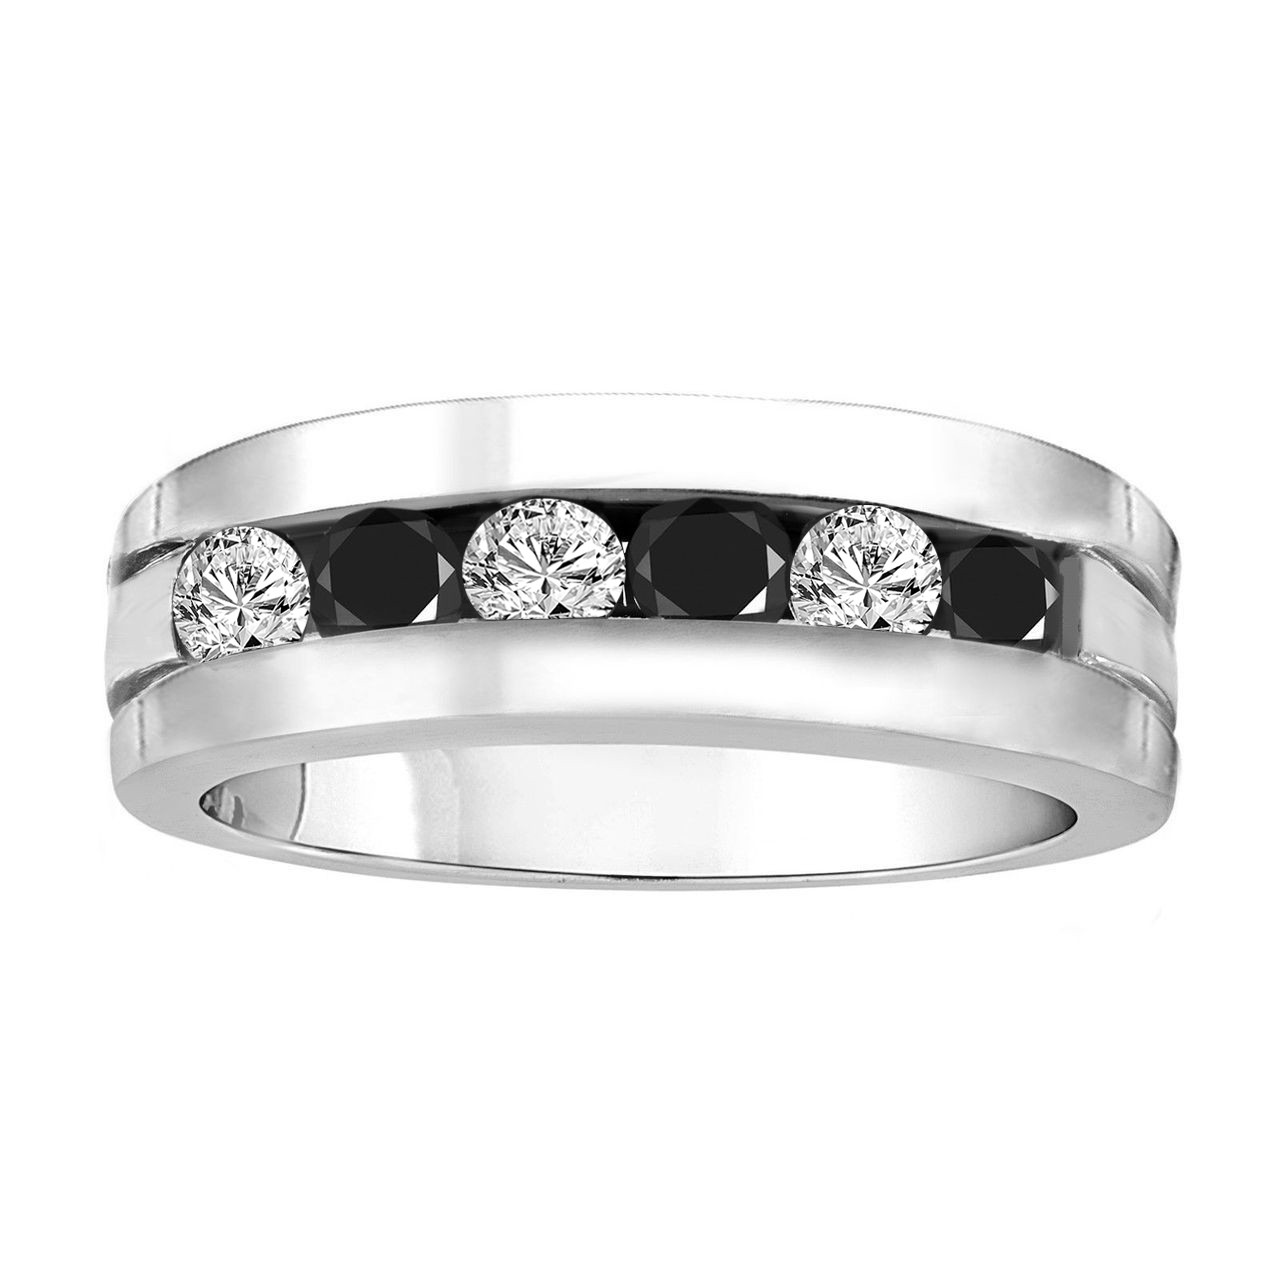 Mens Diamonds Wedding Ring Alternating Black And White Diamonds Wedding Band 1 60 Carat Anniversary Band 14k White Gold